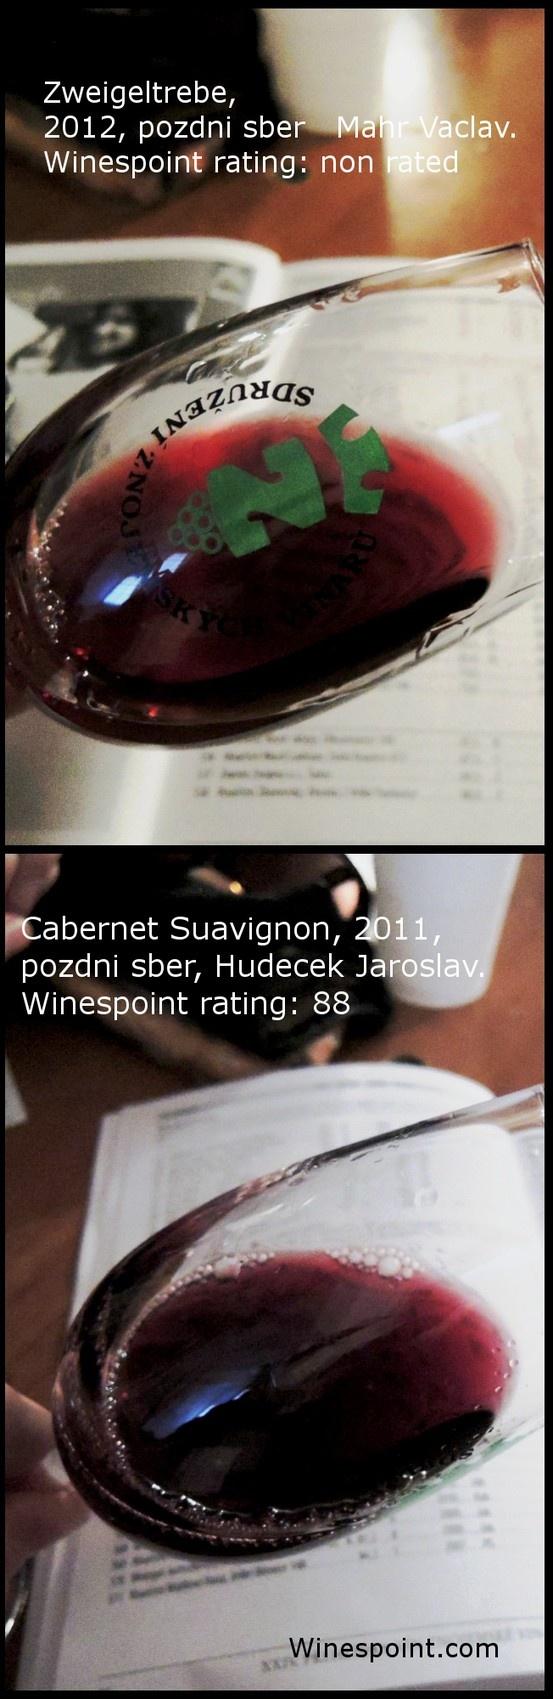 Cabernet Sauvignon, 2011, pozdni sber, barrique, Hudecek Jaroslav, Znojmo, Czech Republic. Winespoint rating (03/2013): 88